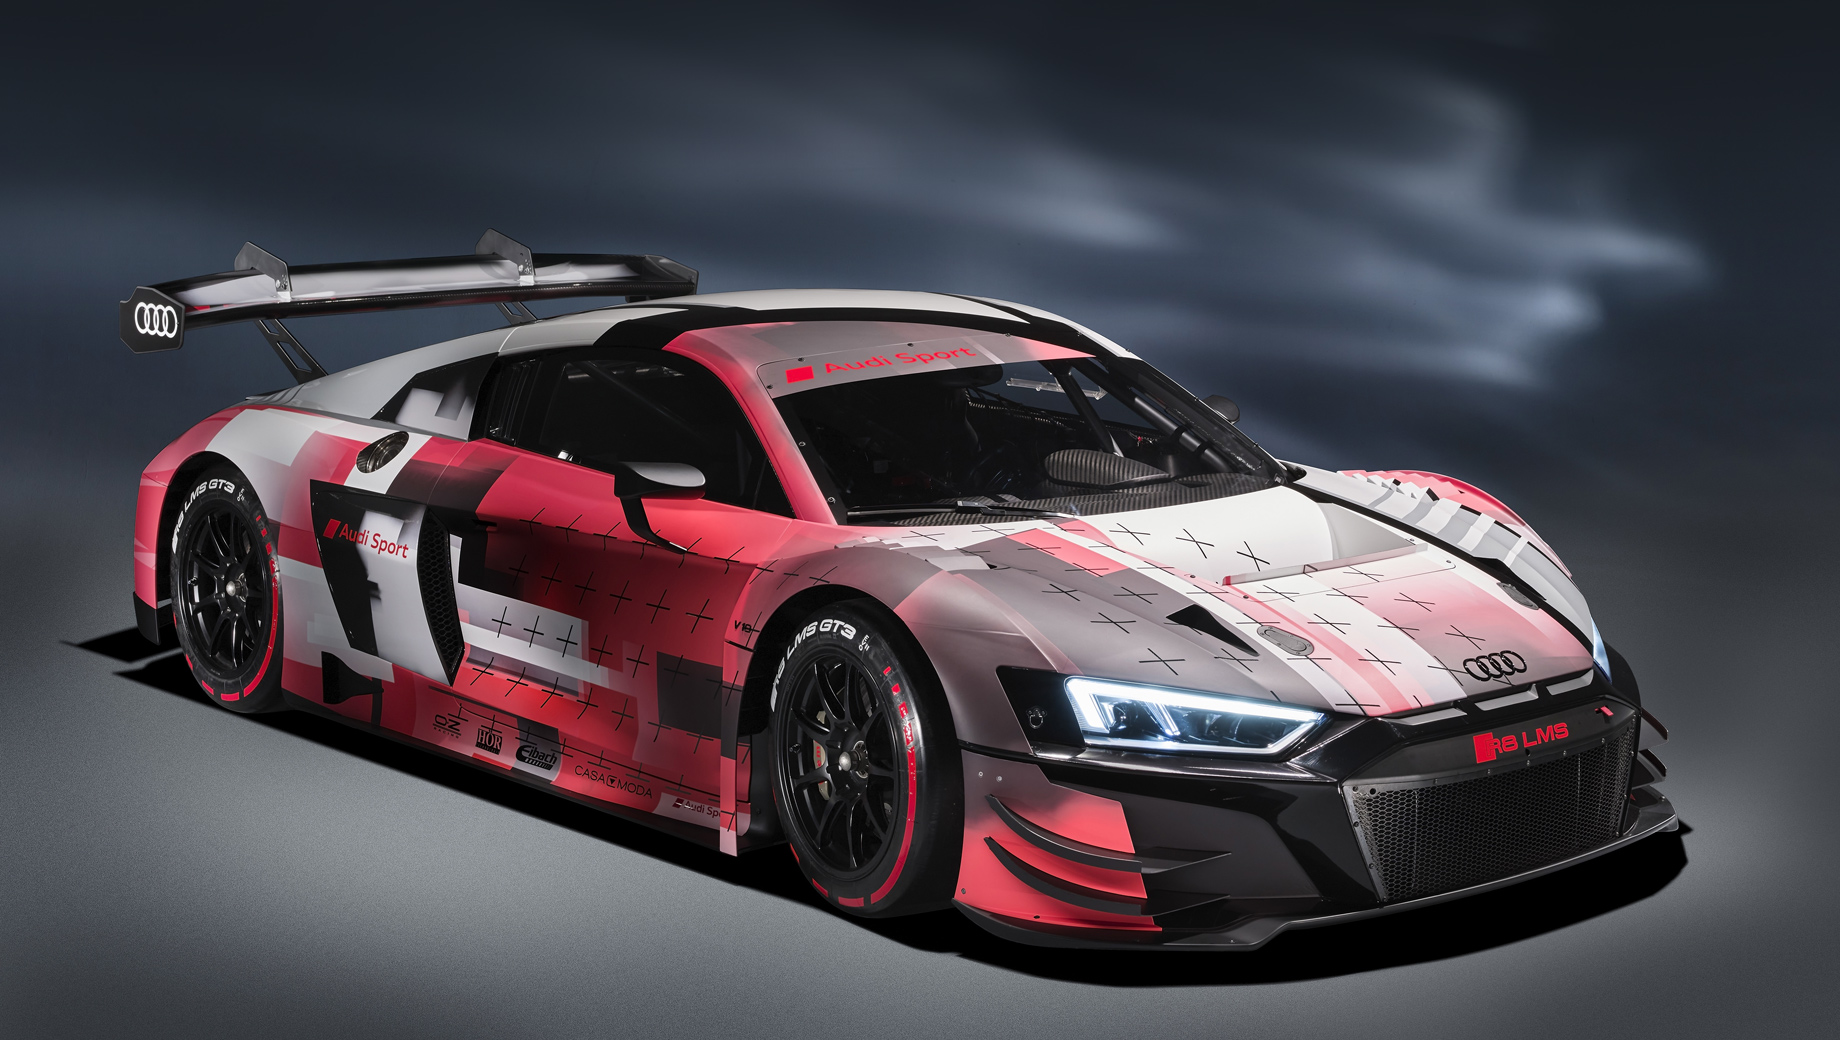 Audi R8 LMS GT3 Evo II привлечёт клиентов широтой настроек